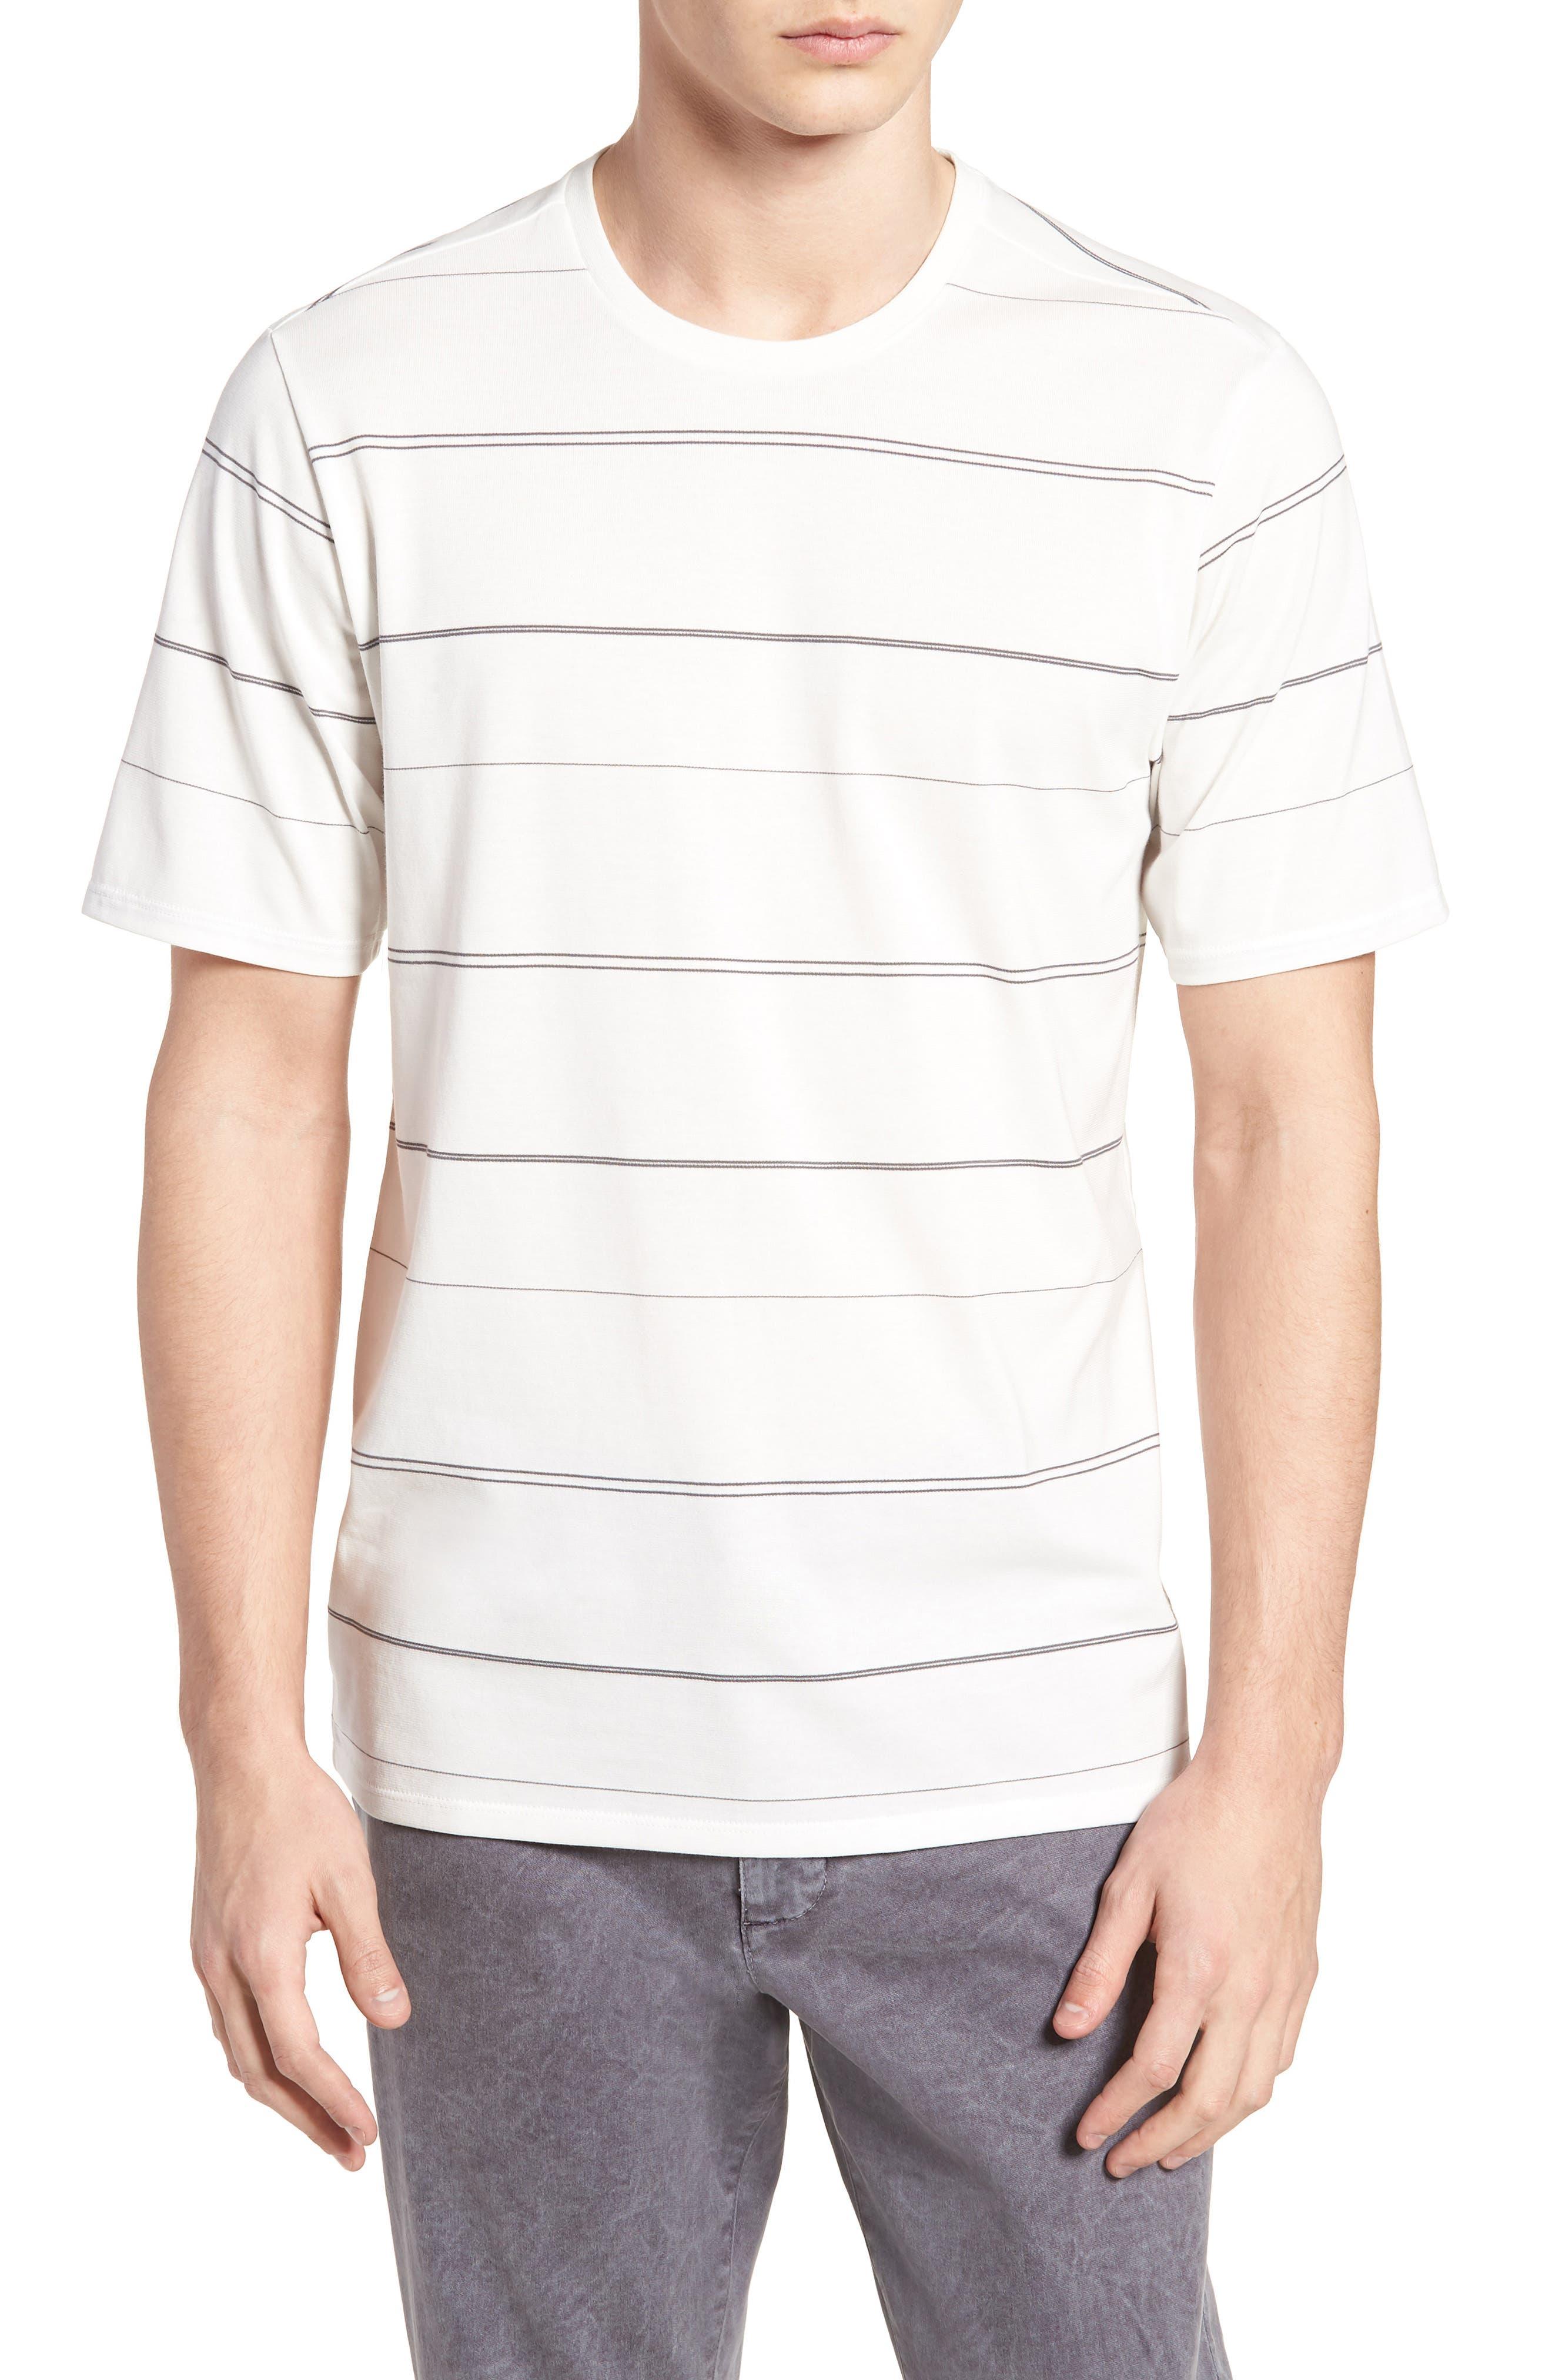 Main Image - Hurley Dri-FIT New Wave T-Shirt